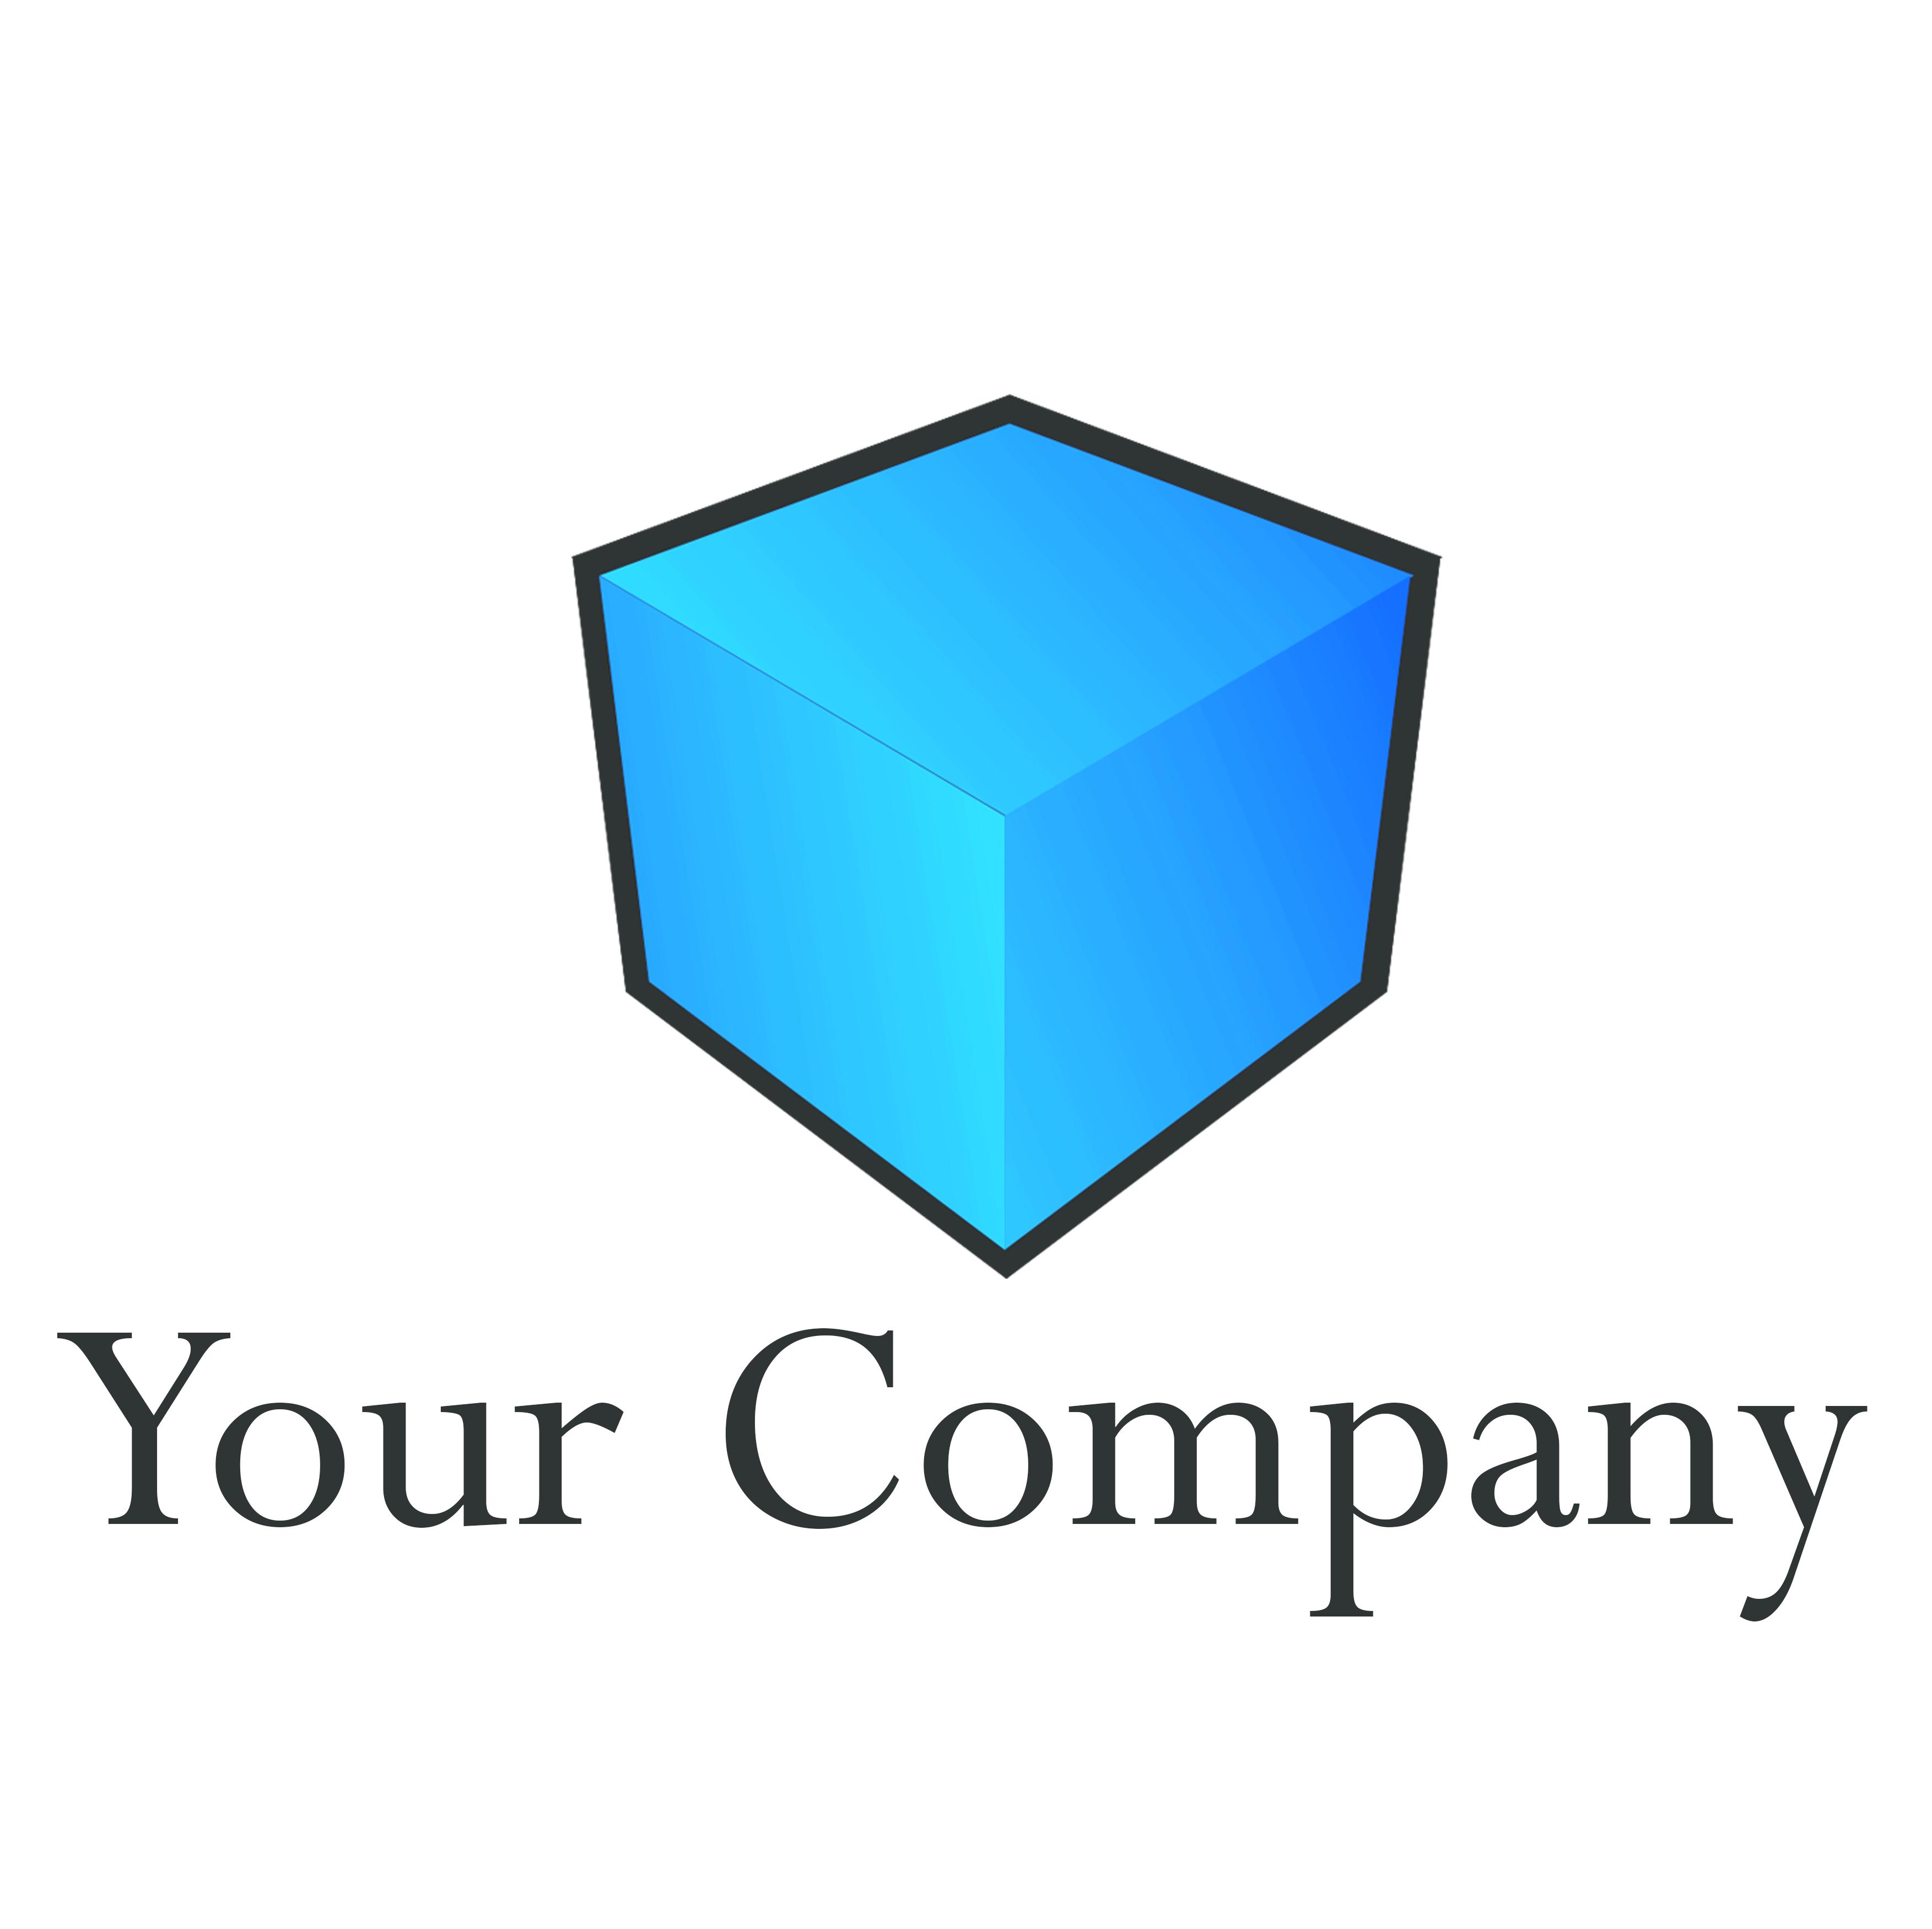 Blue Cube logo